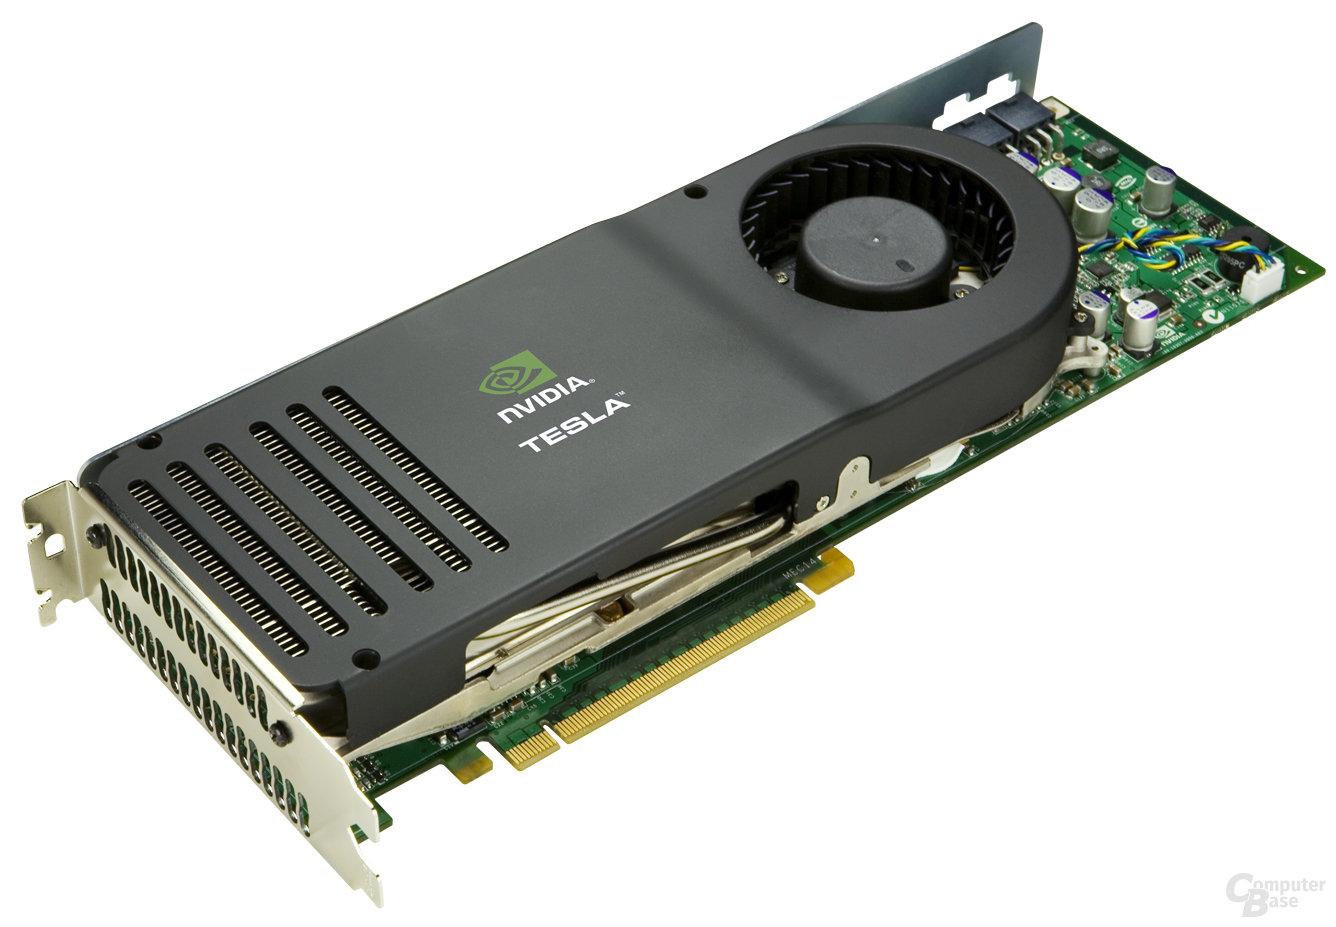 nVidia Tesla C870 GPU Computing Processor